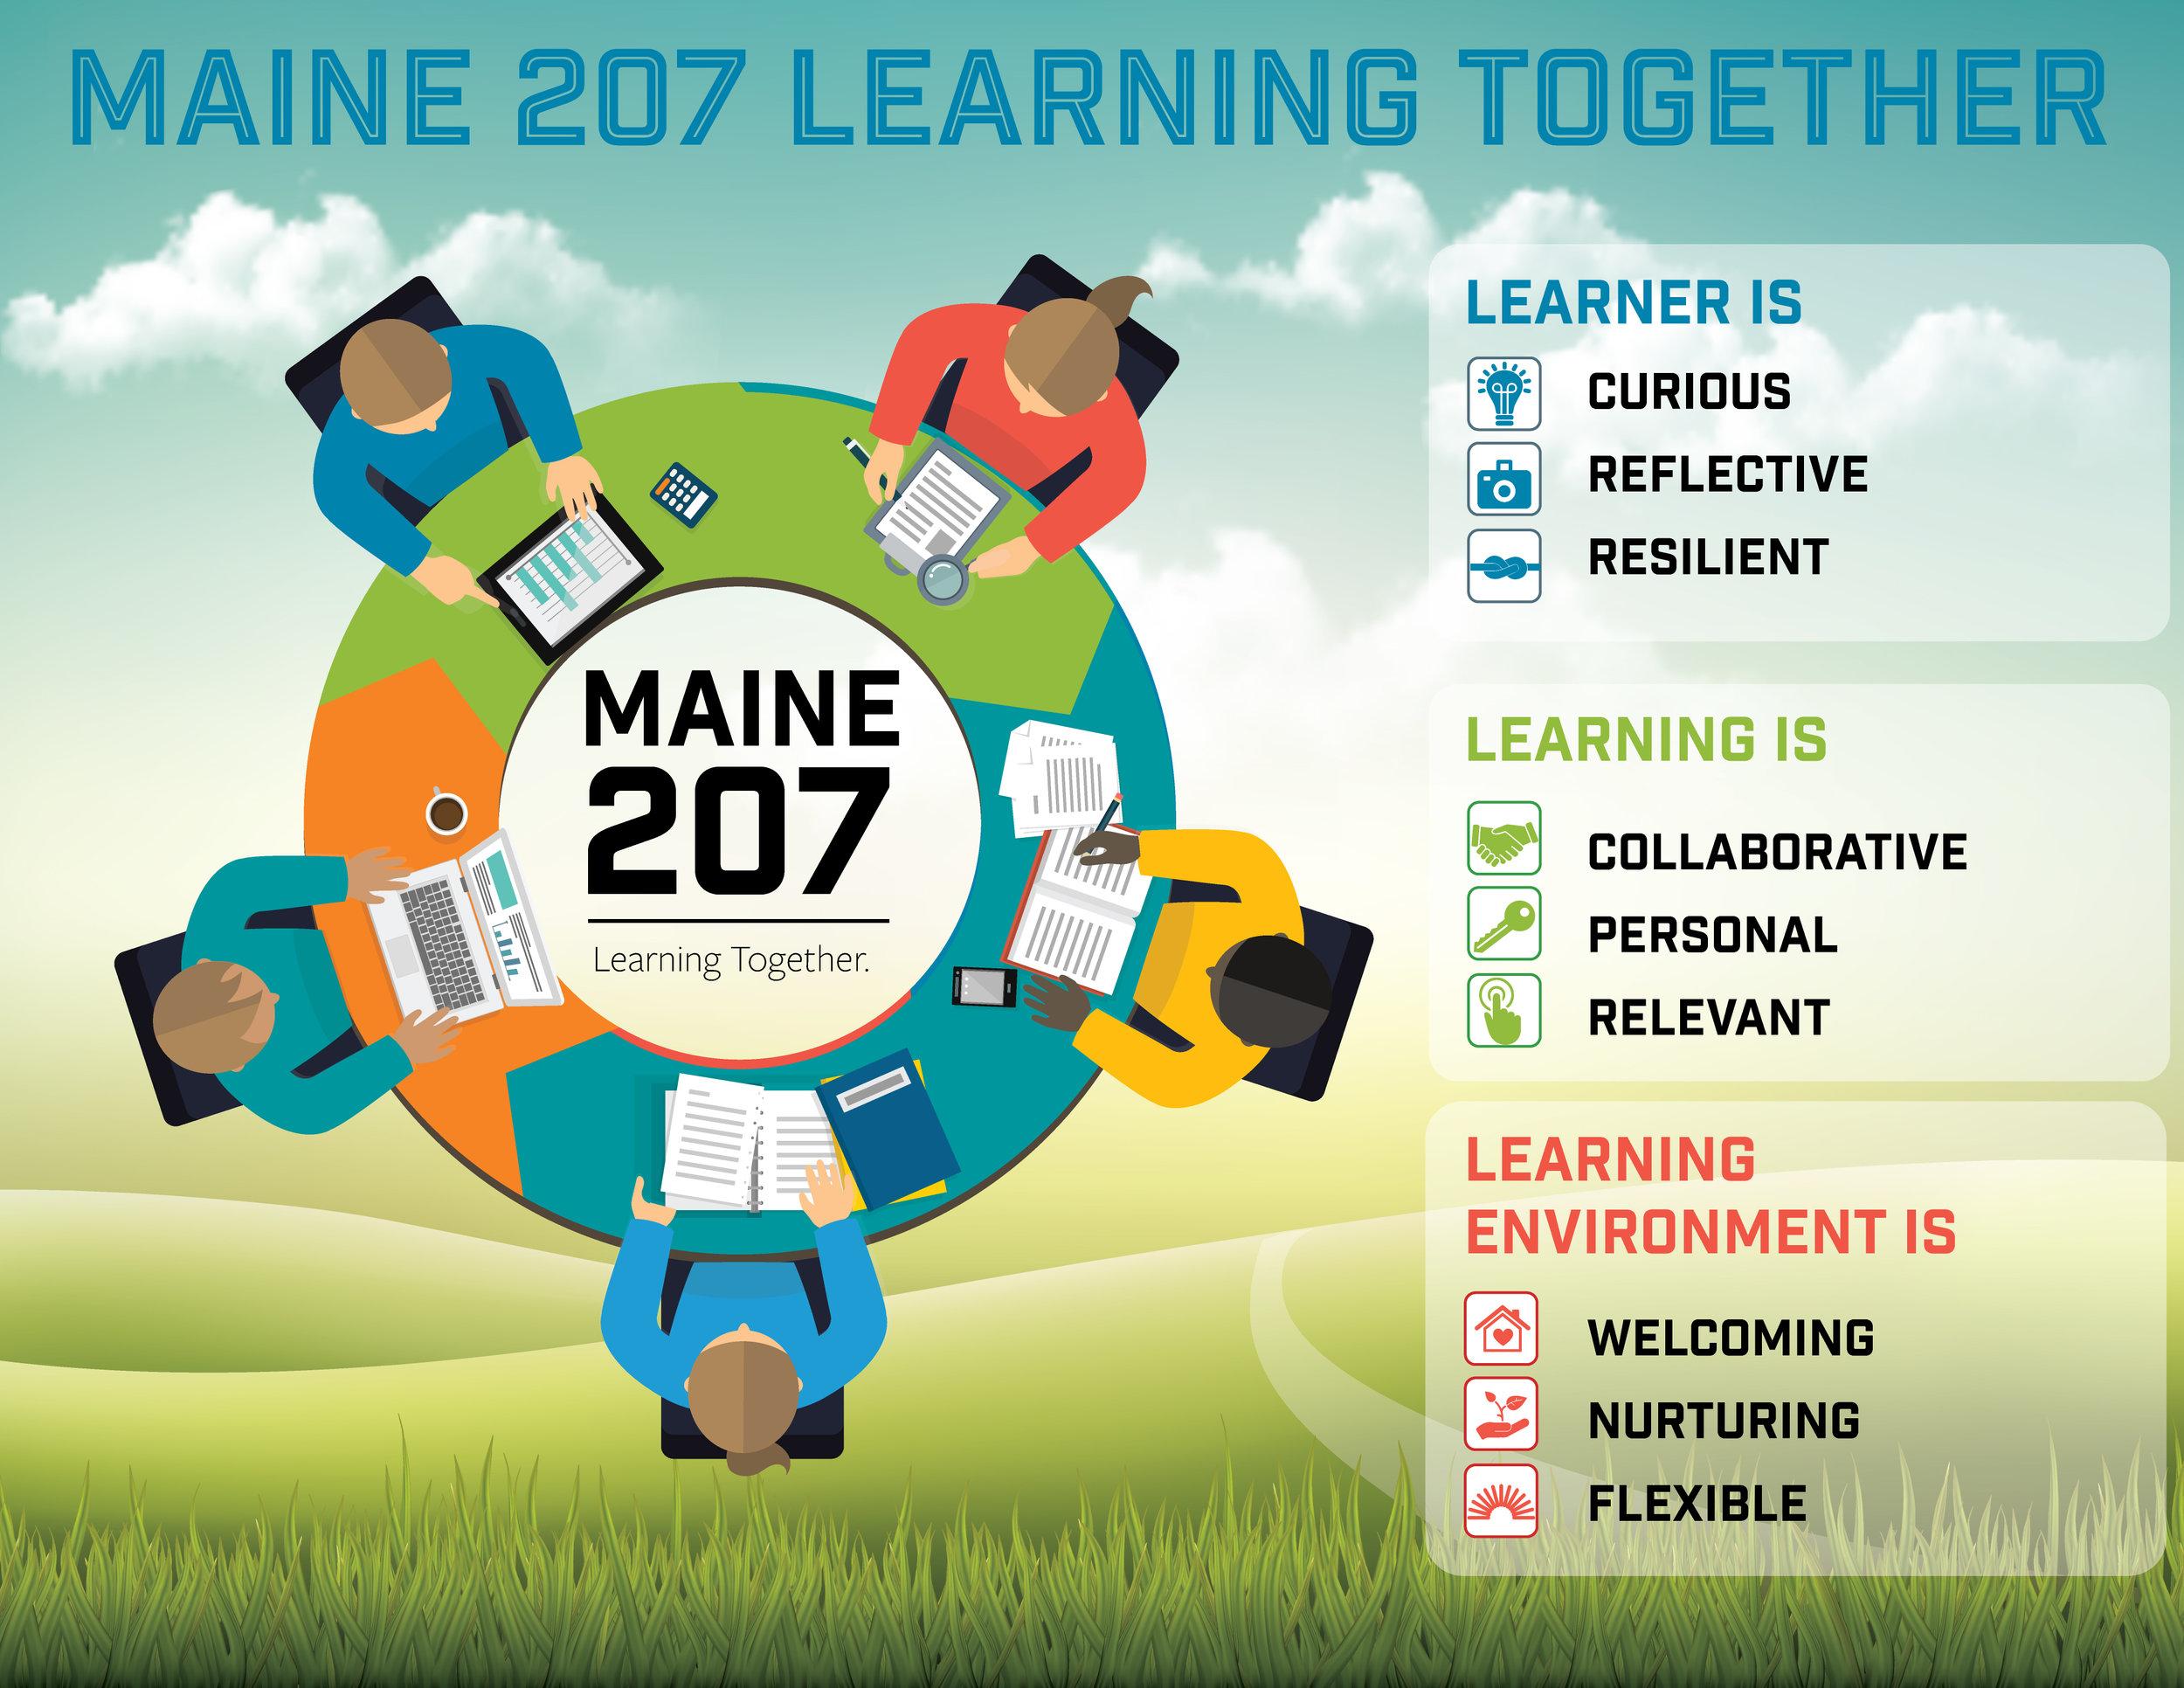 Maine207_Strategy_FINAL.jpg